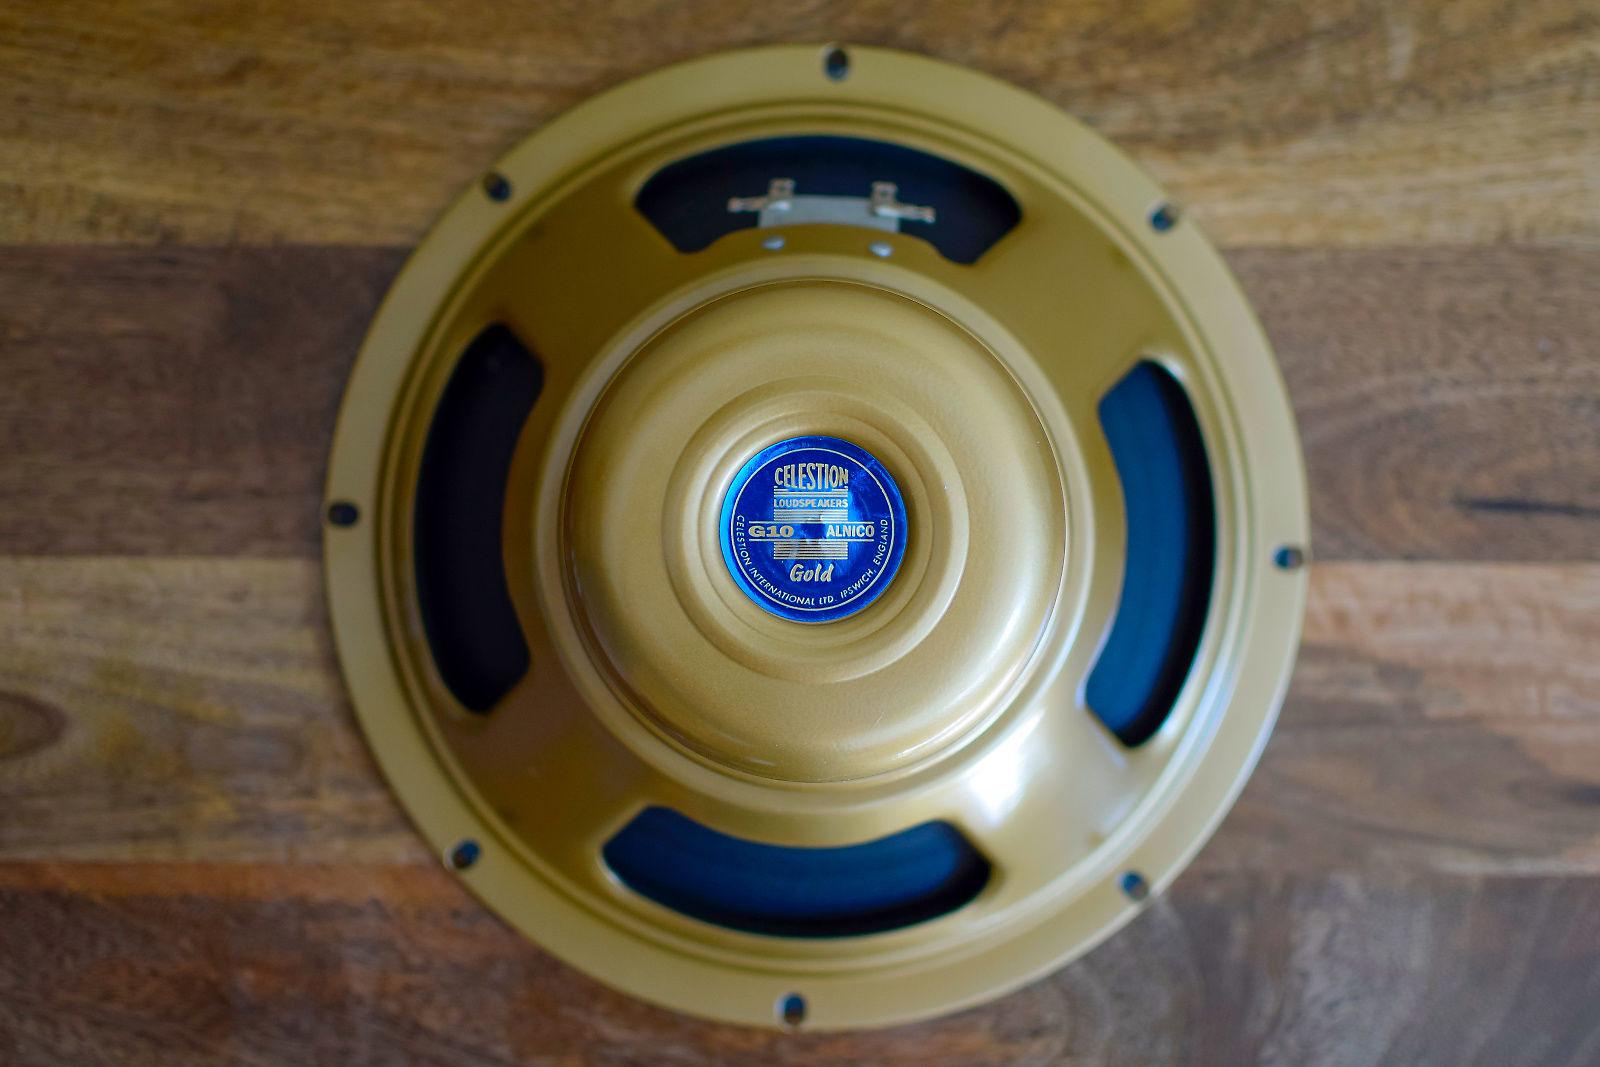 Celestion G10AG-15 Alnico Gold 10